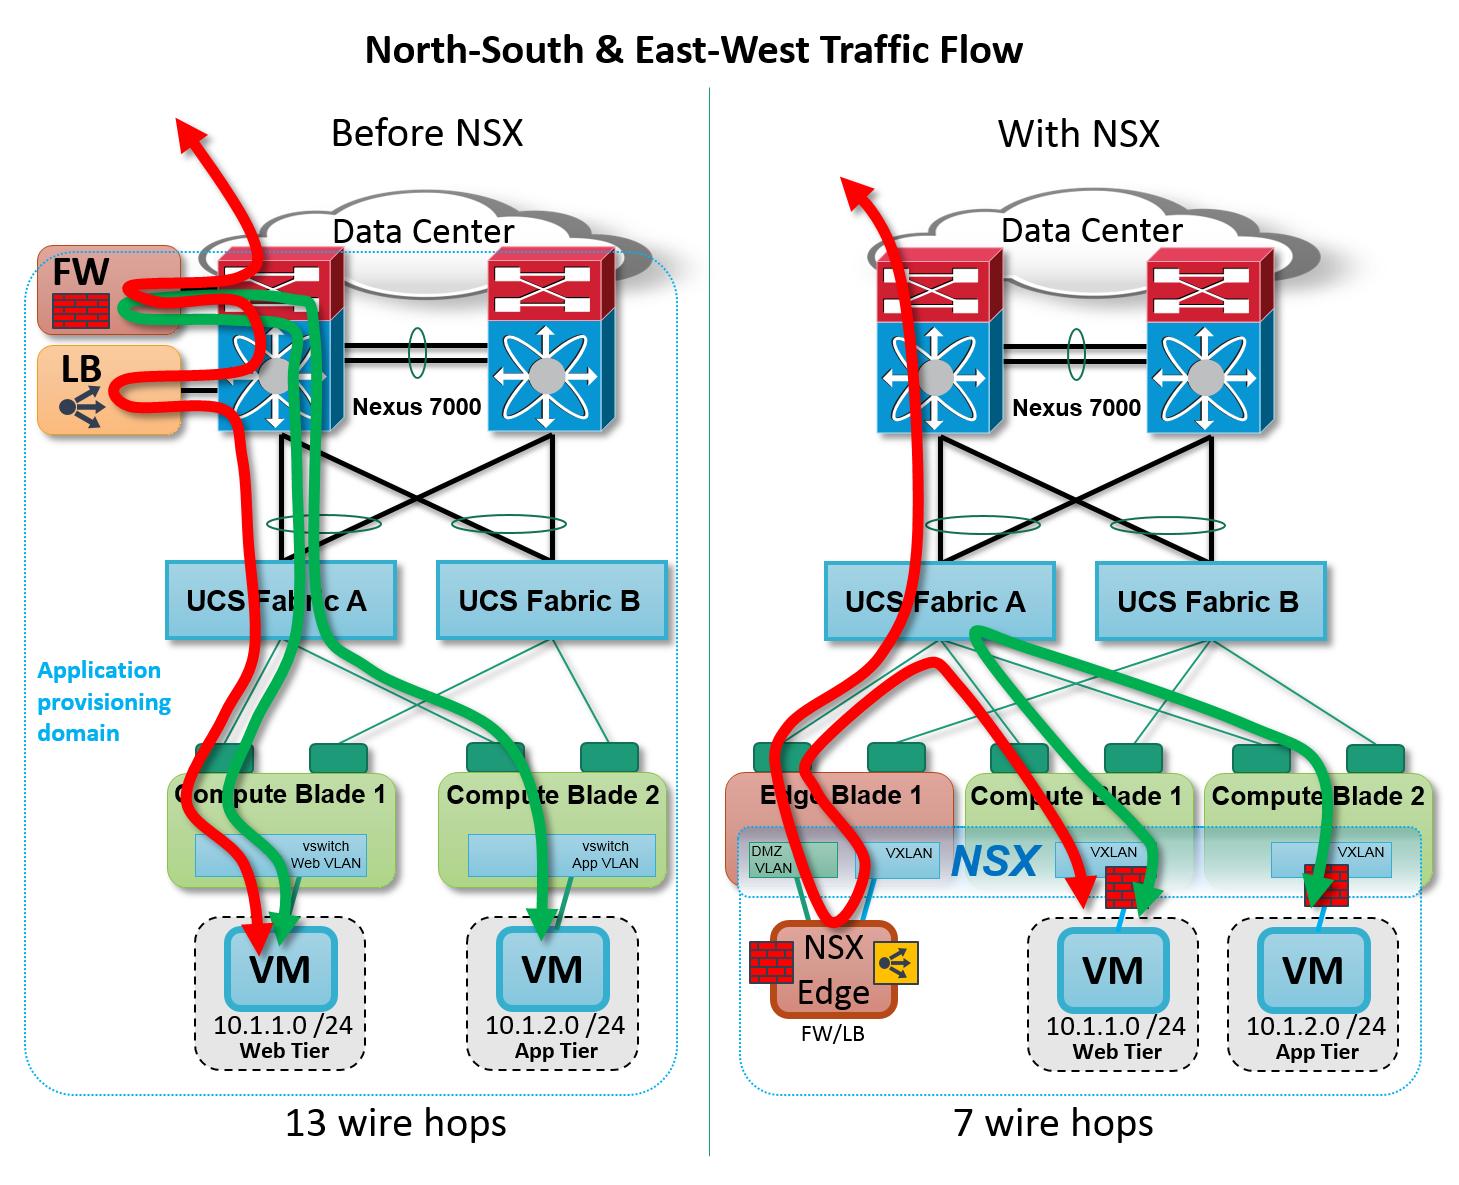 Bradhedlund Vmw Blog Nsx Cisco Nsx Cisco Traffic Flow Multi Host V3 Png 1459 1185 Cisco Networking Computer Network Ccna